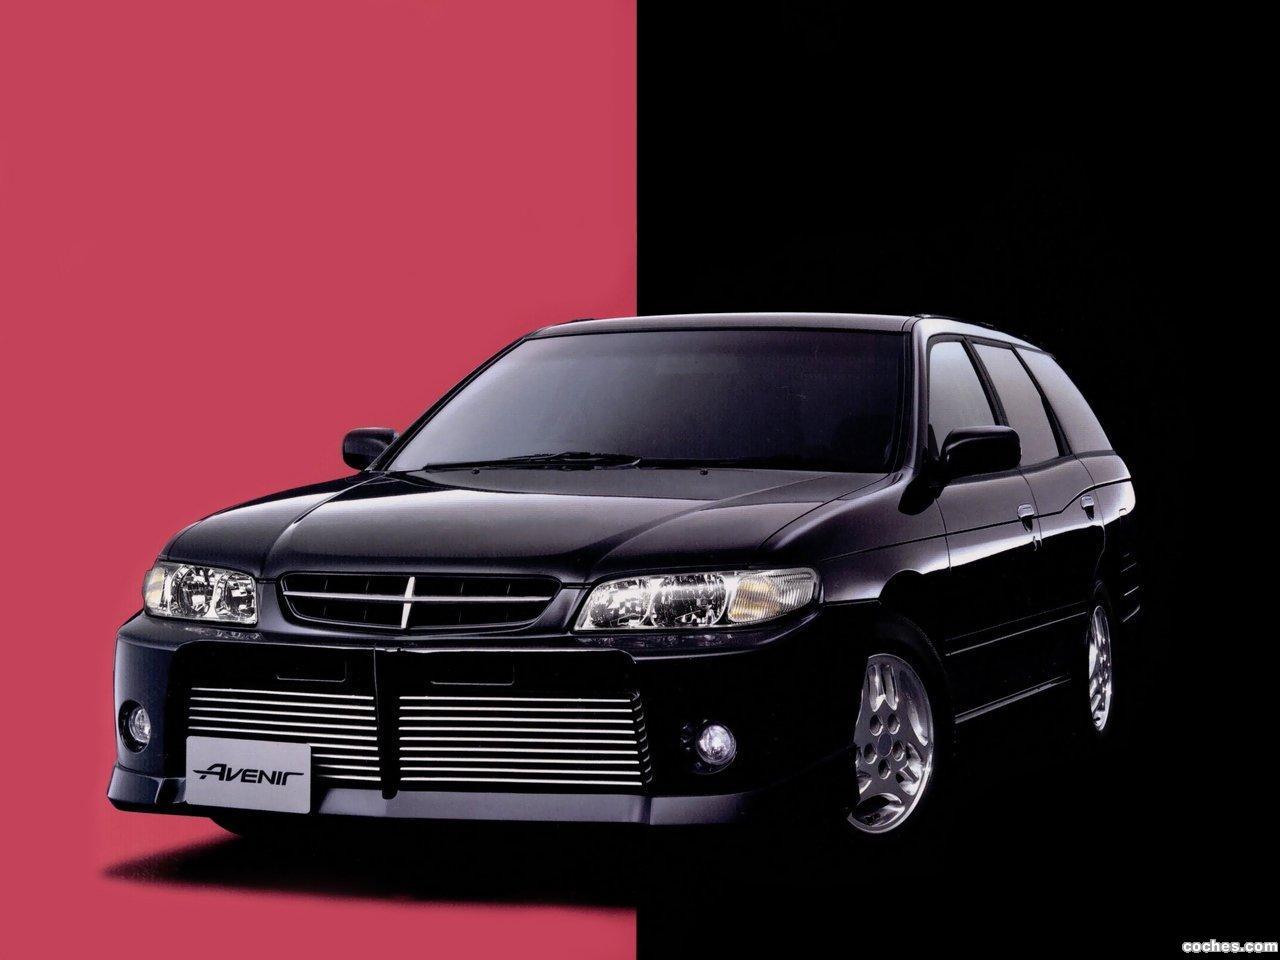 Foto 0 de Nissan Avenir Rider 1998